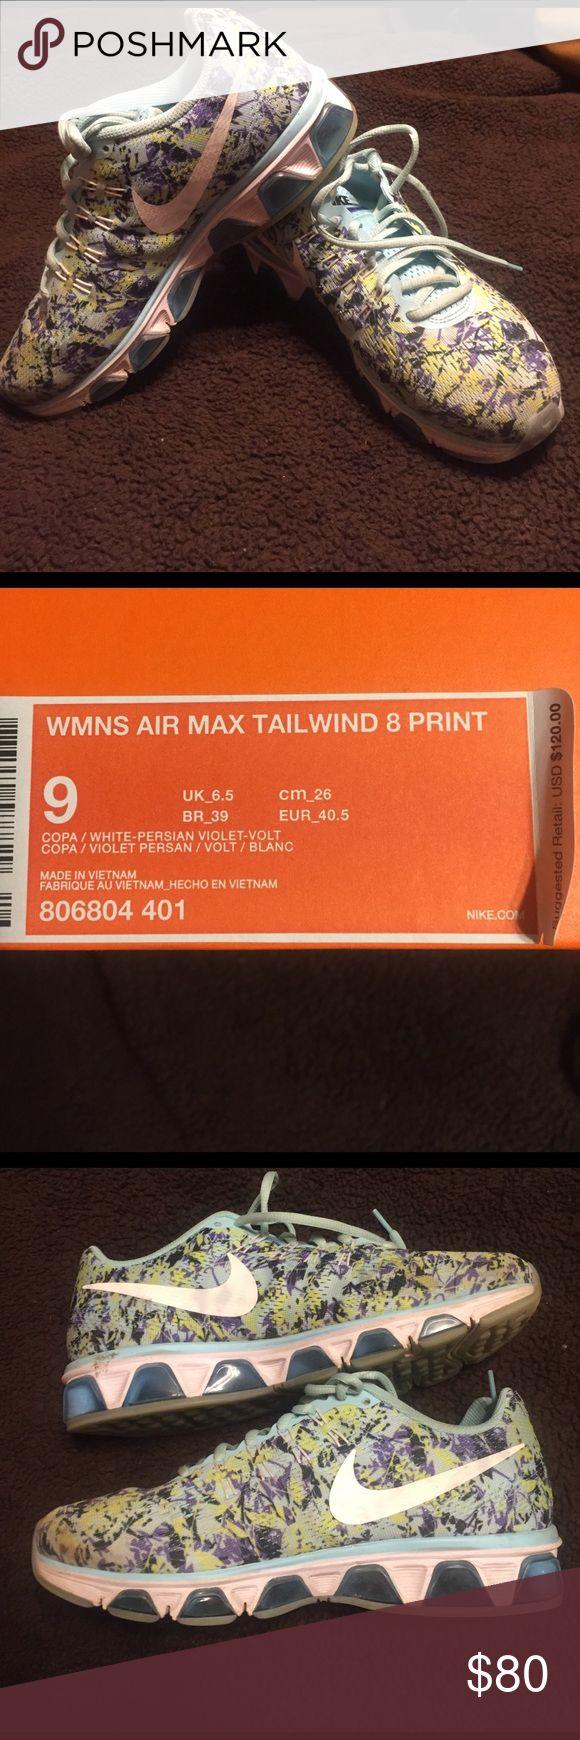 Nike Air Max Tailwind 8 Print women's 9 Nike Air Max Tailwind 8 Print. Women's 8. Gently used. Normal wear. Smoke free home. Nike Shoes Athletic Shoes